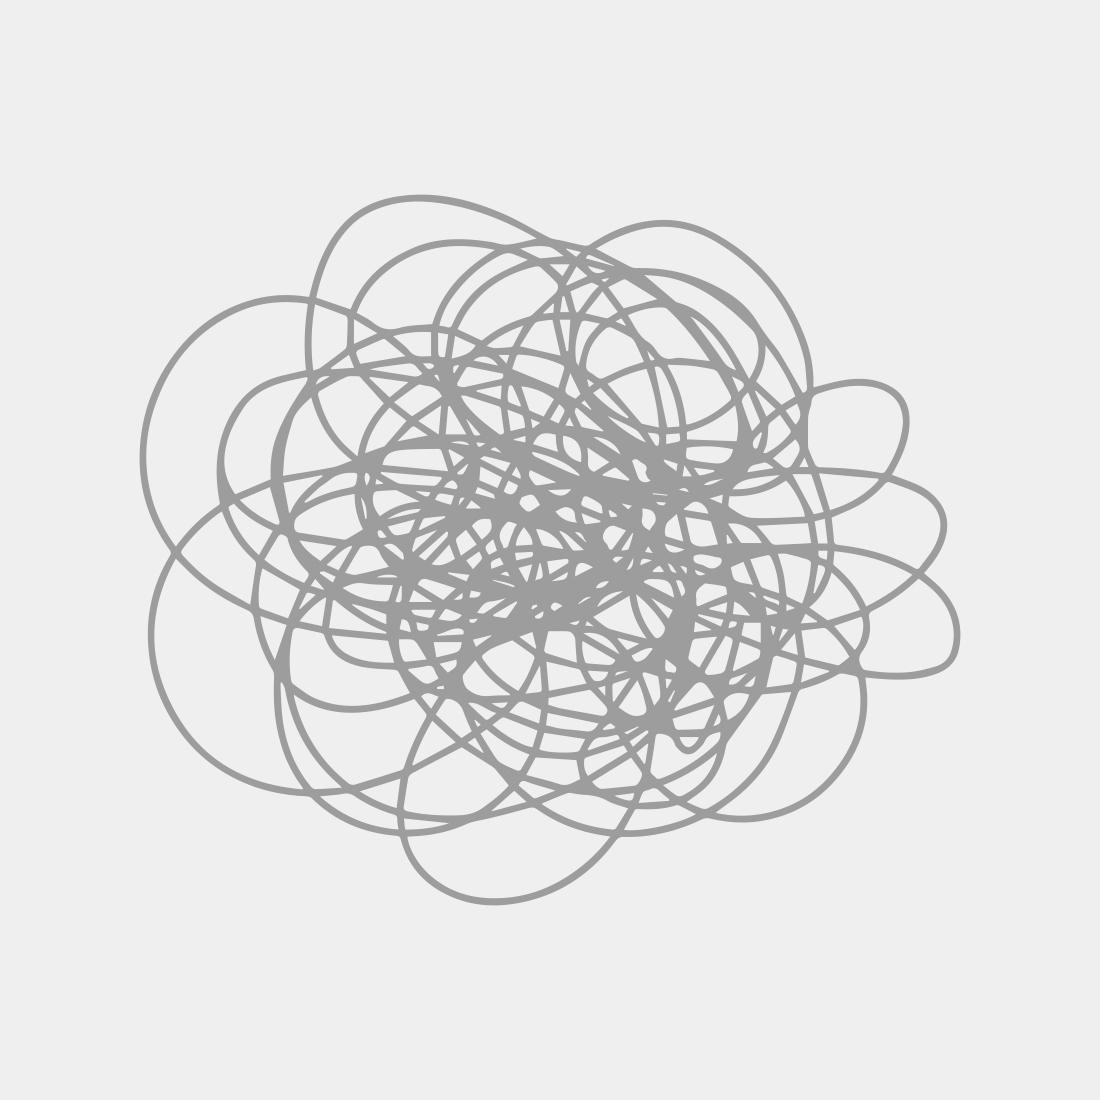 Burlington House: Home of the Royal Academy of Arts